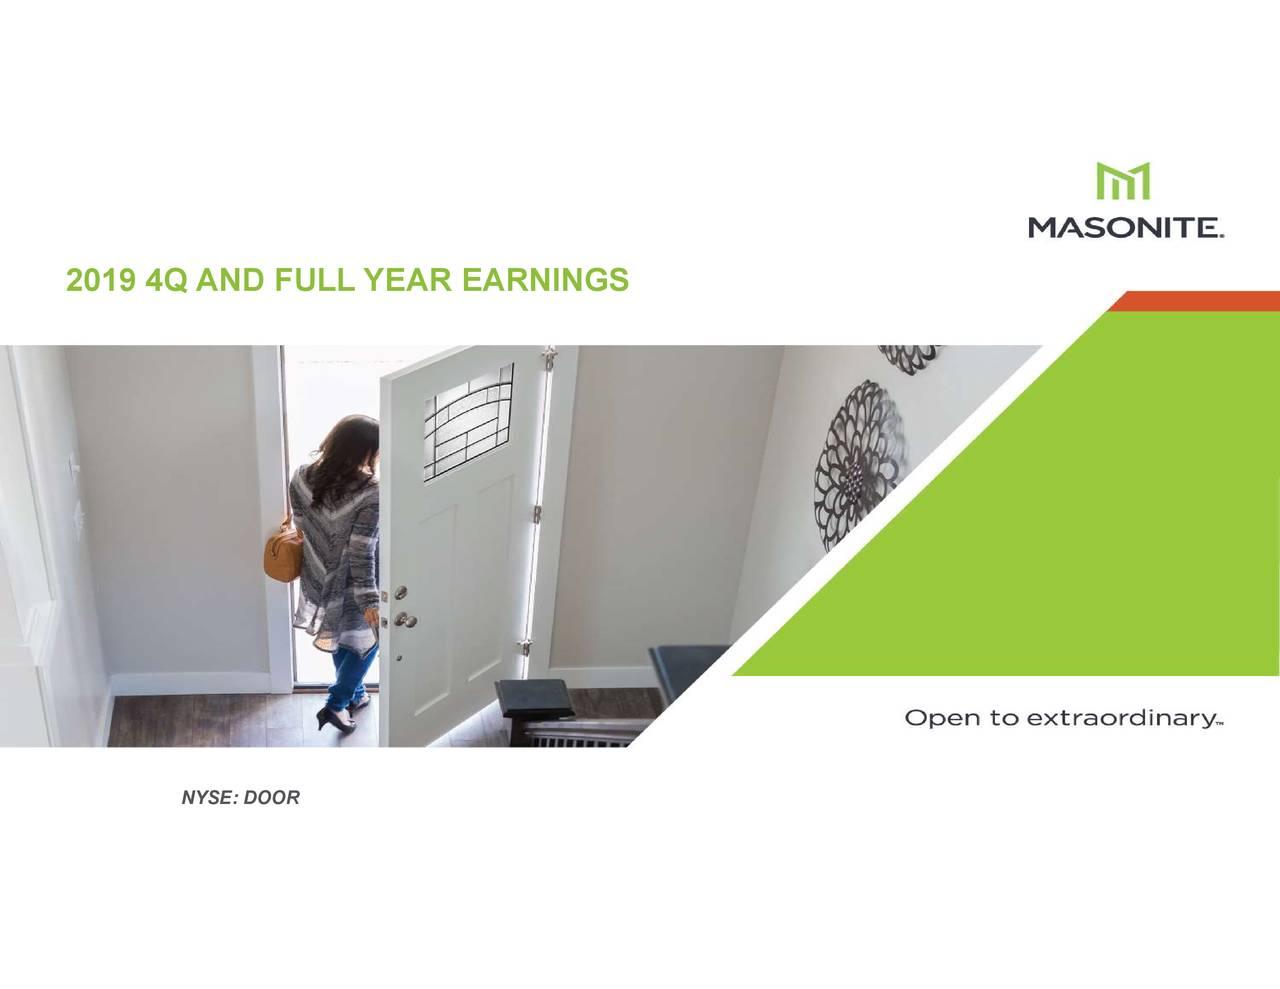 Masonite International Corporation 2019 Q4 - Results - Earnings Call Presentation - Masonite International Corporation (NYSE:DOOR) | Seeking Alpha